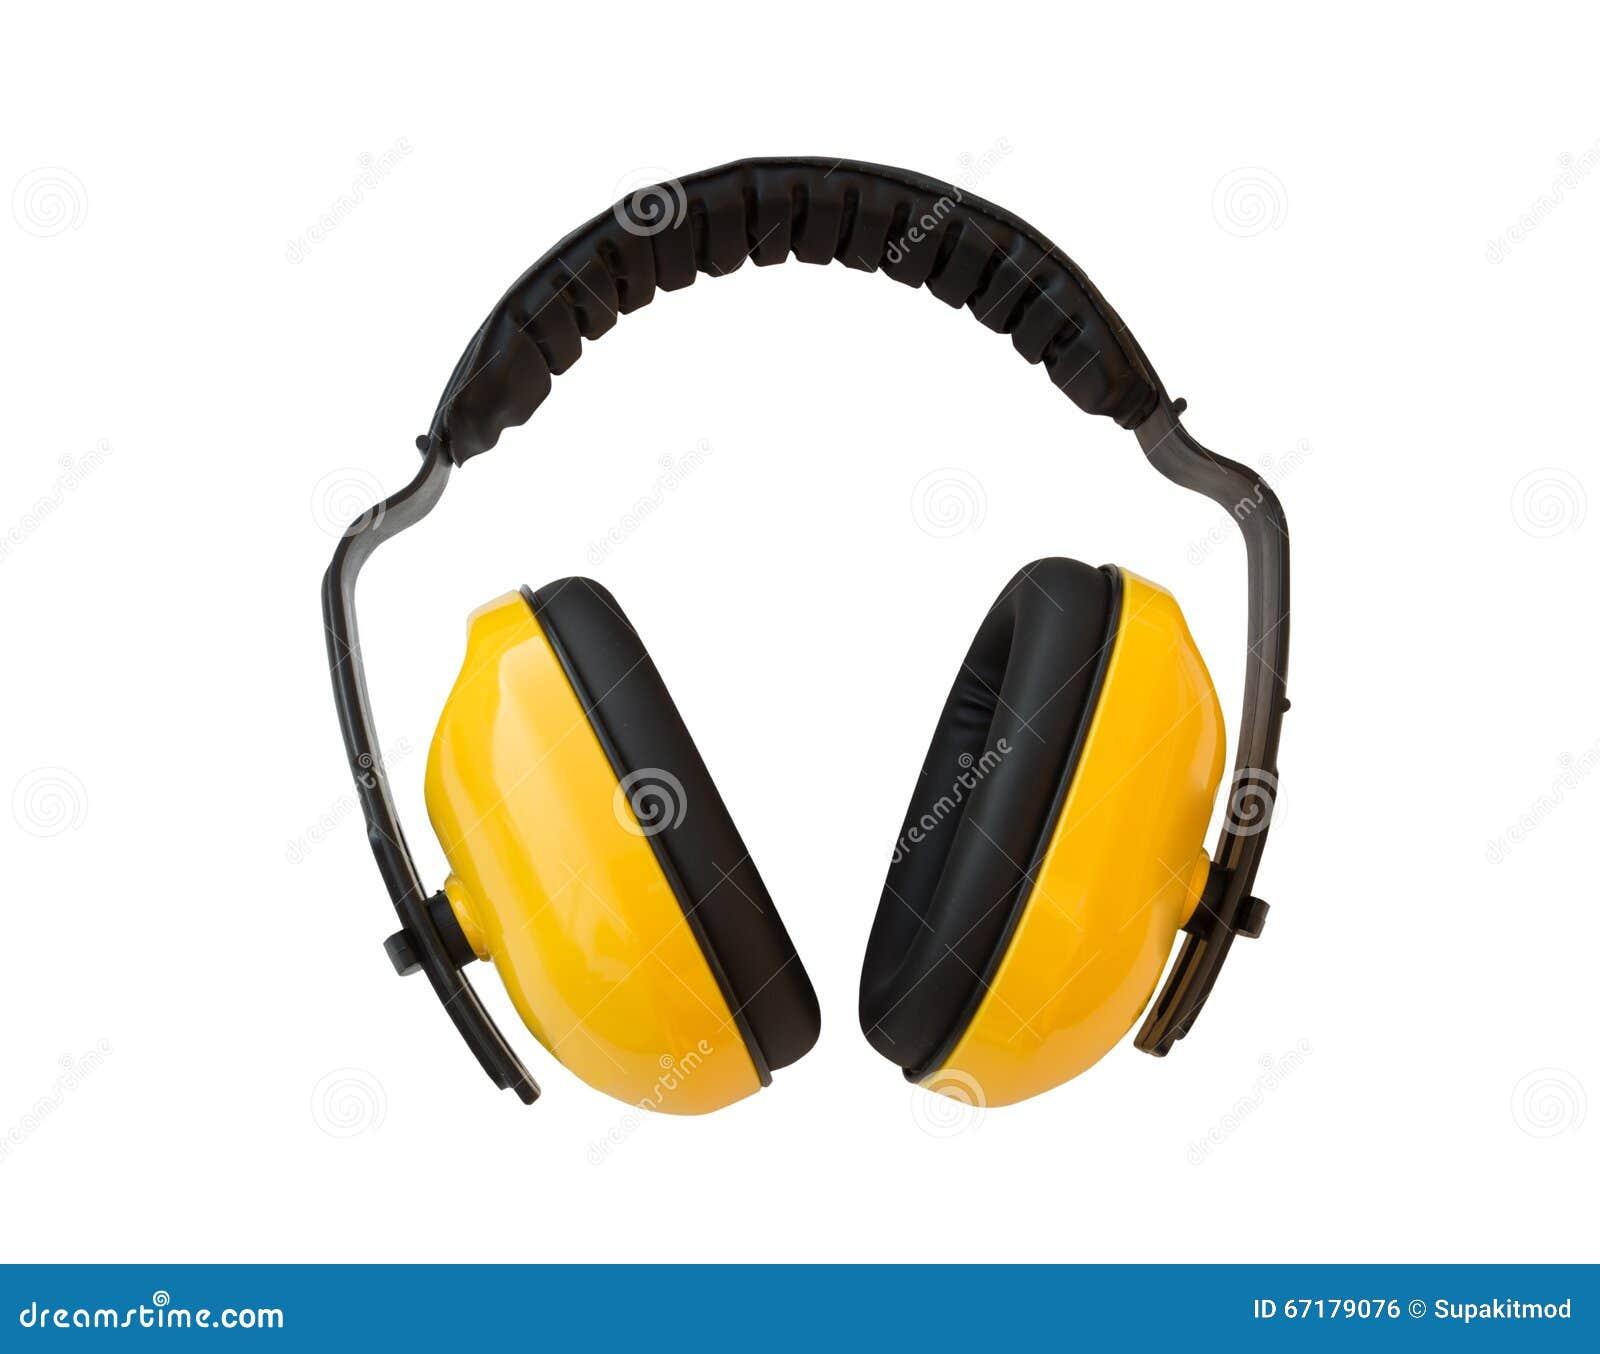 Ear , For noise protection ear